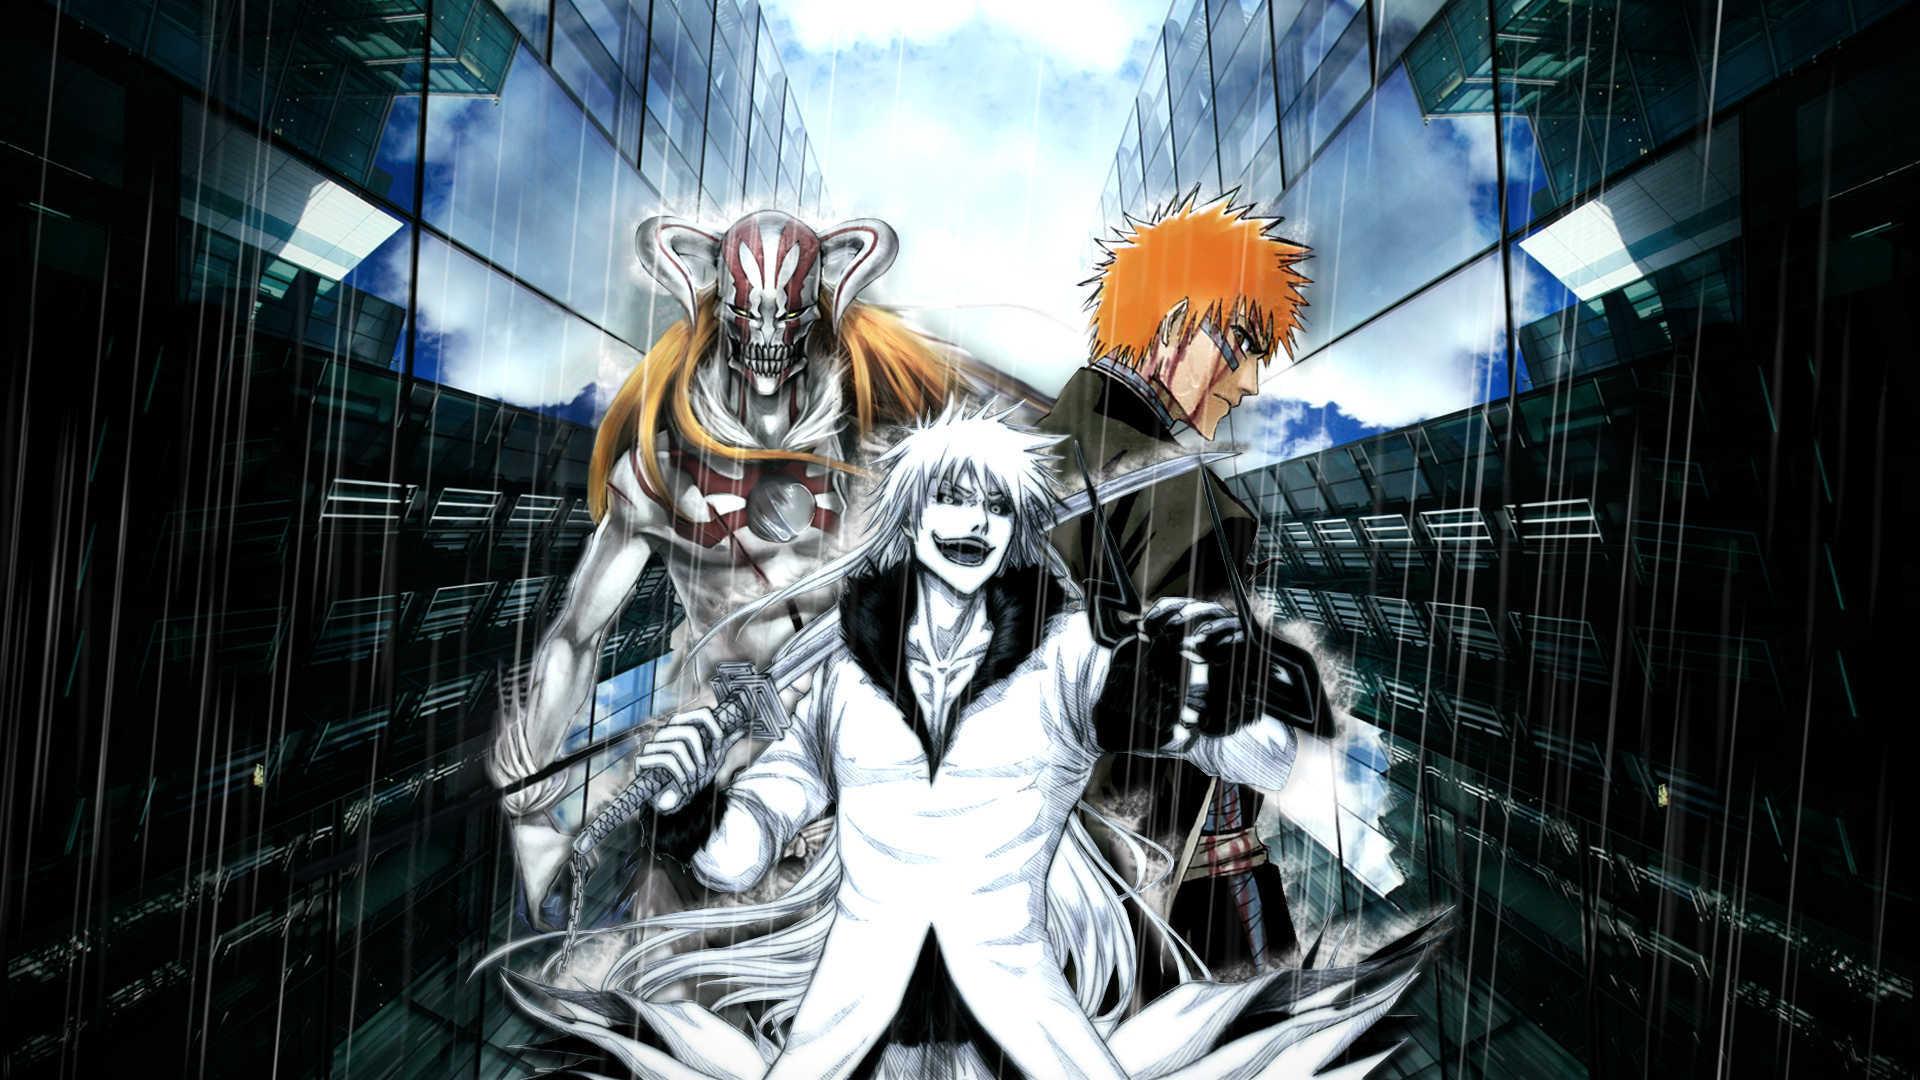 Bleach Anime Iphone Wallpaper